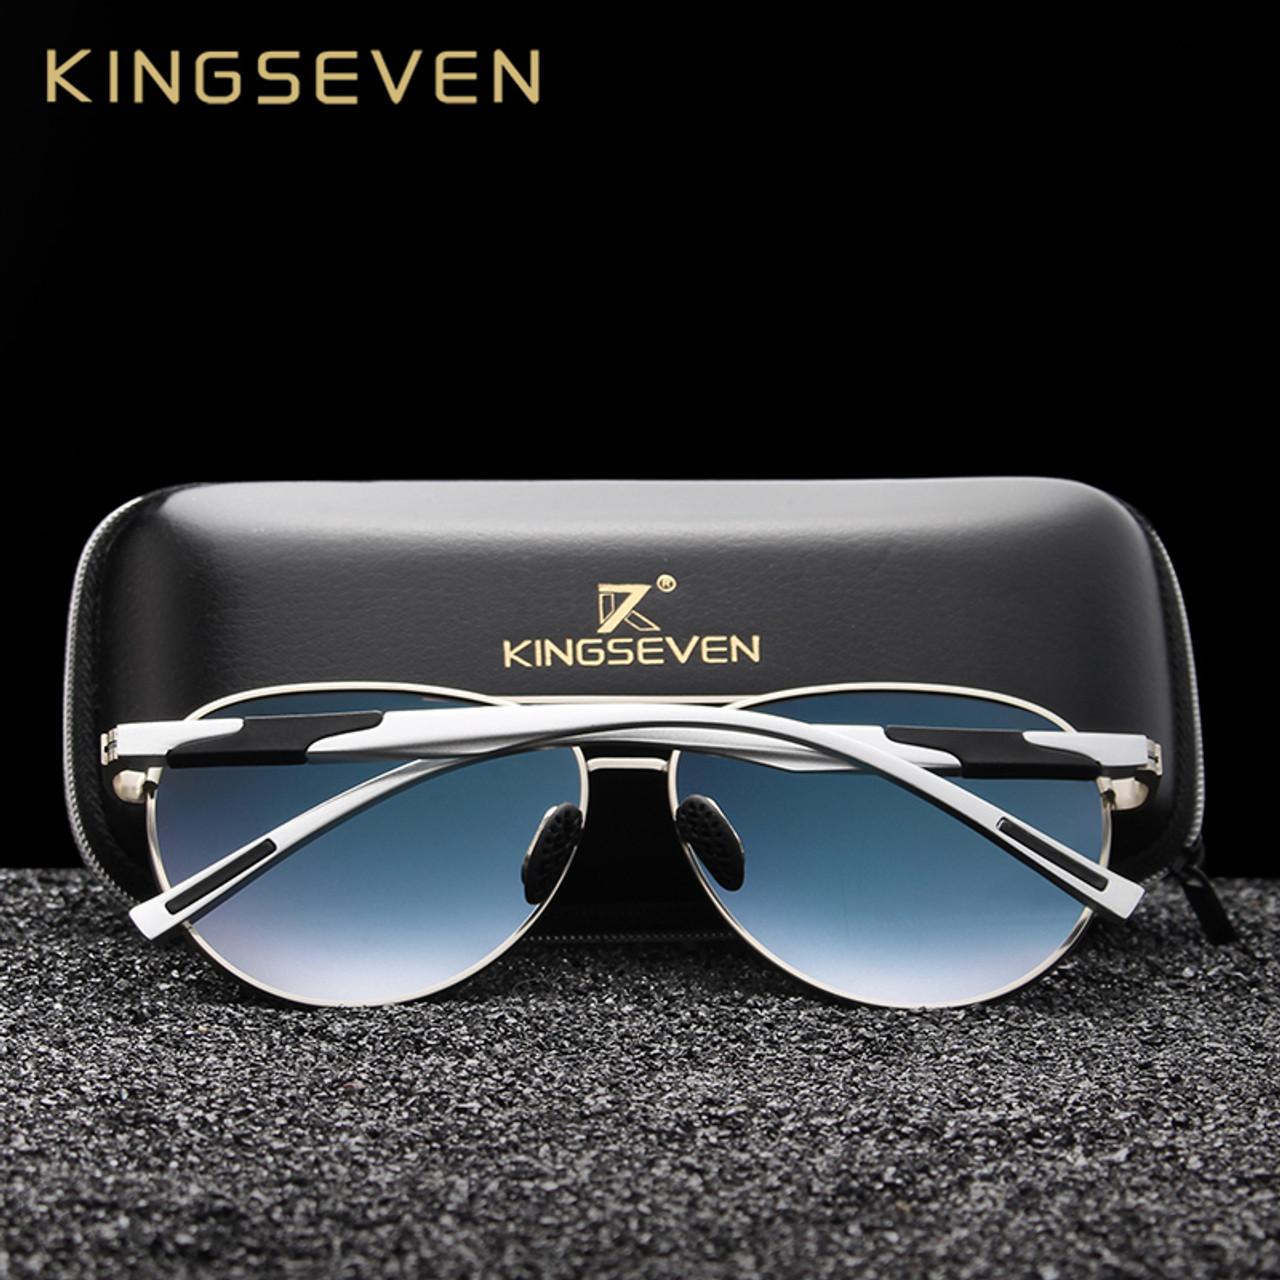 af7aa9122be0 ... KINGSEVEN DESIGN Men Classic Polarized Sunglasses Aluminum Pilot Sun  glasses UV400 Protection NF-7228 ...